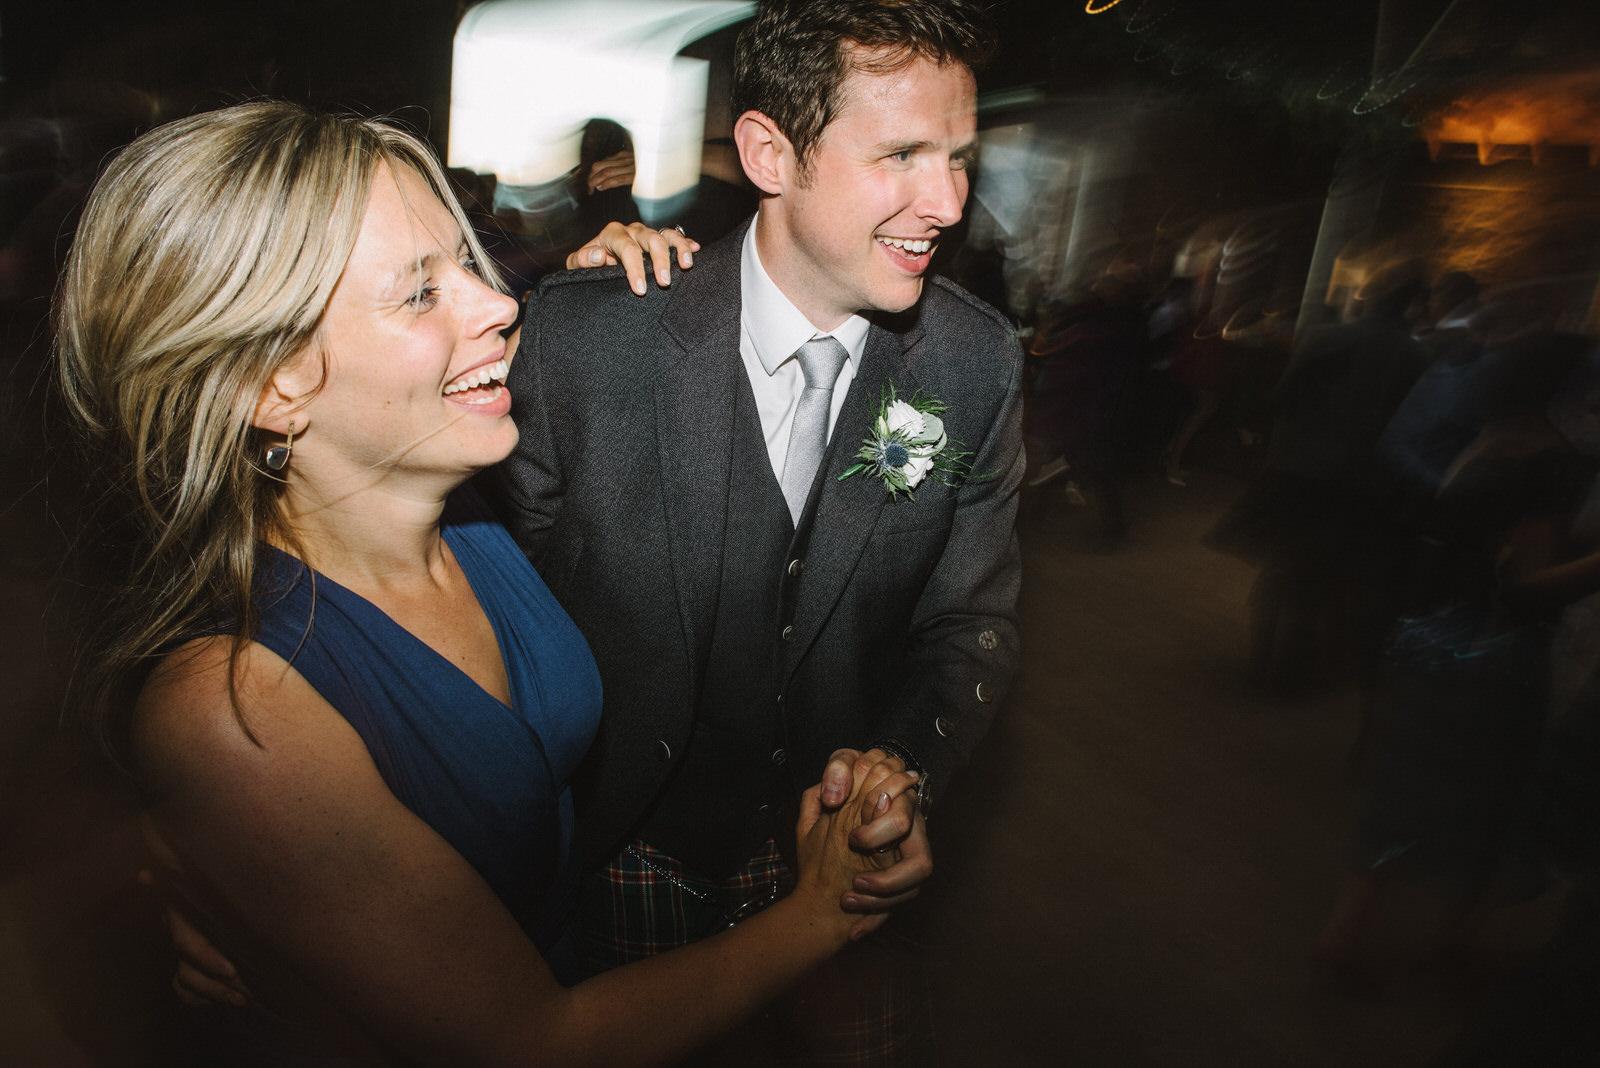 066-GUARDSWELL-FARM-WEDDING-ALTERNATIVE-SCOTTISH-WEDDING-PHOTOGRAPHER-SCOTTISH-WEDDING-DESTINATION-WEDDING-PHOTOGRAPHER.JPG